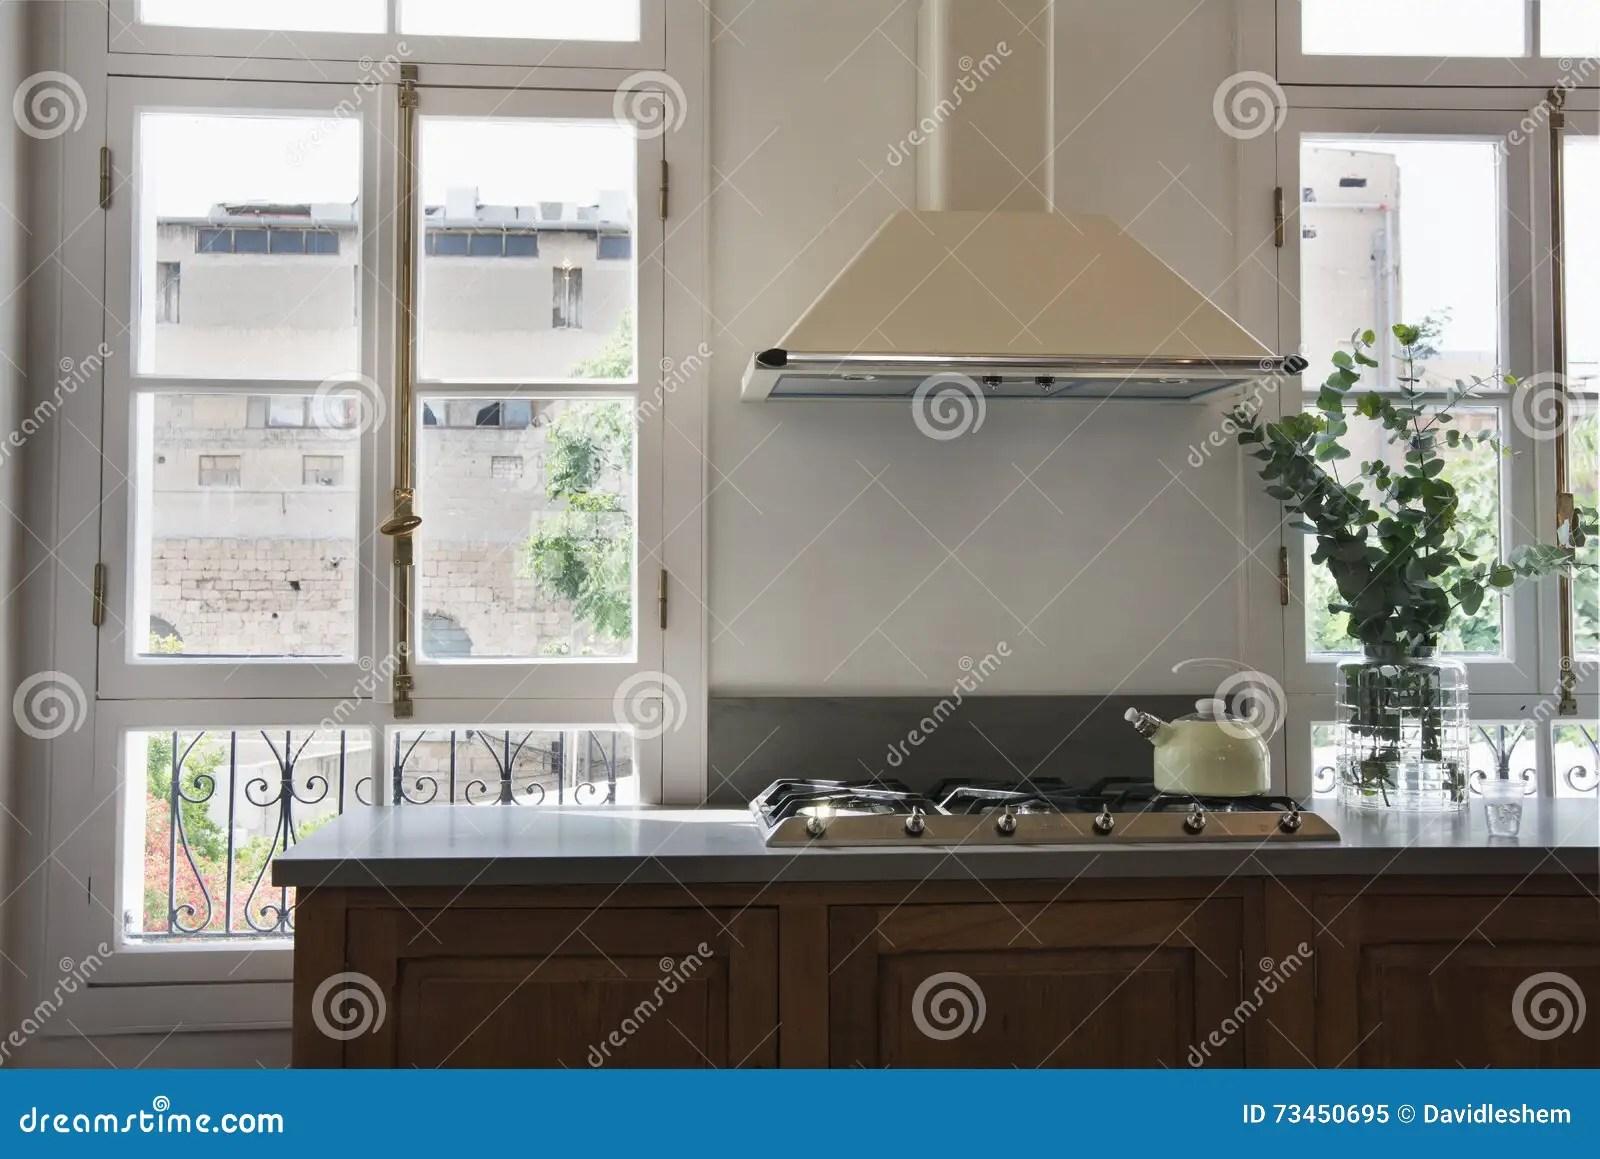 kitchen swag curtains oakley sink backpack review 有落地长窗的经典厨房库存图片 图片包括有经典 装饰 典雅 厨房 法国 有大落地长窗的经典现代厨房